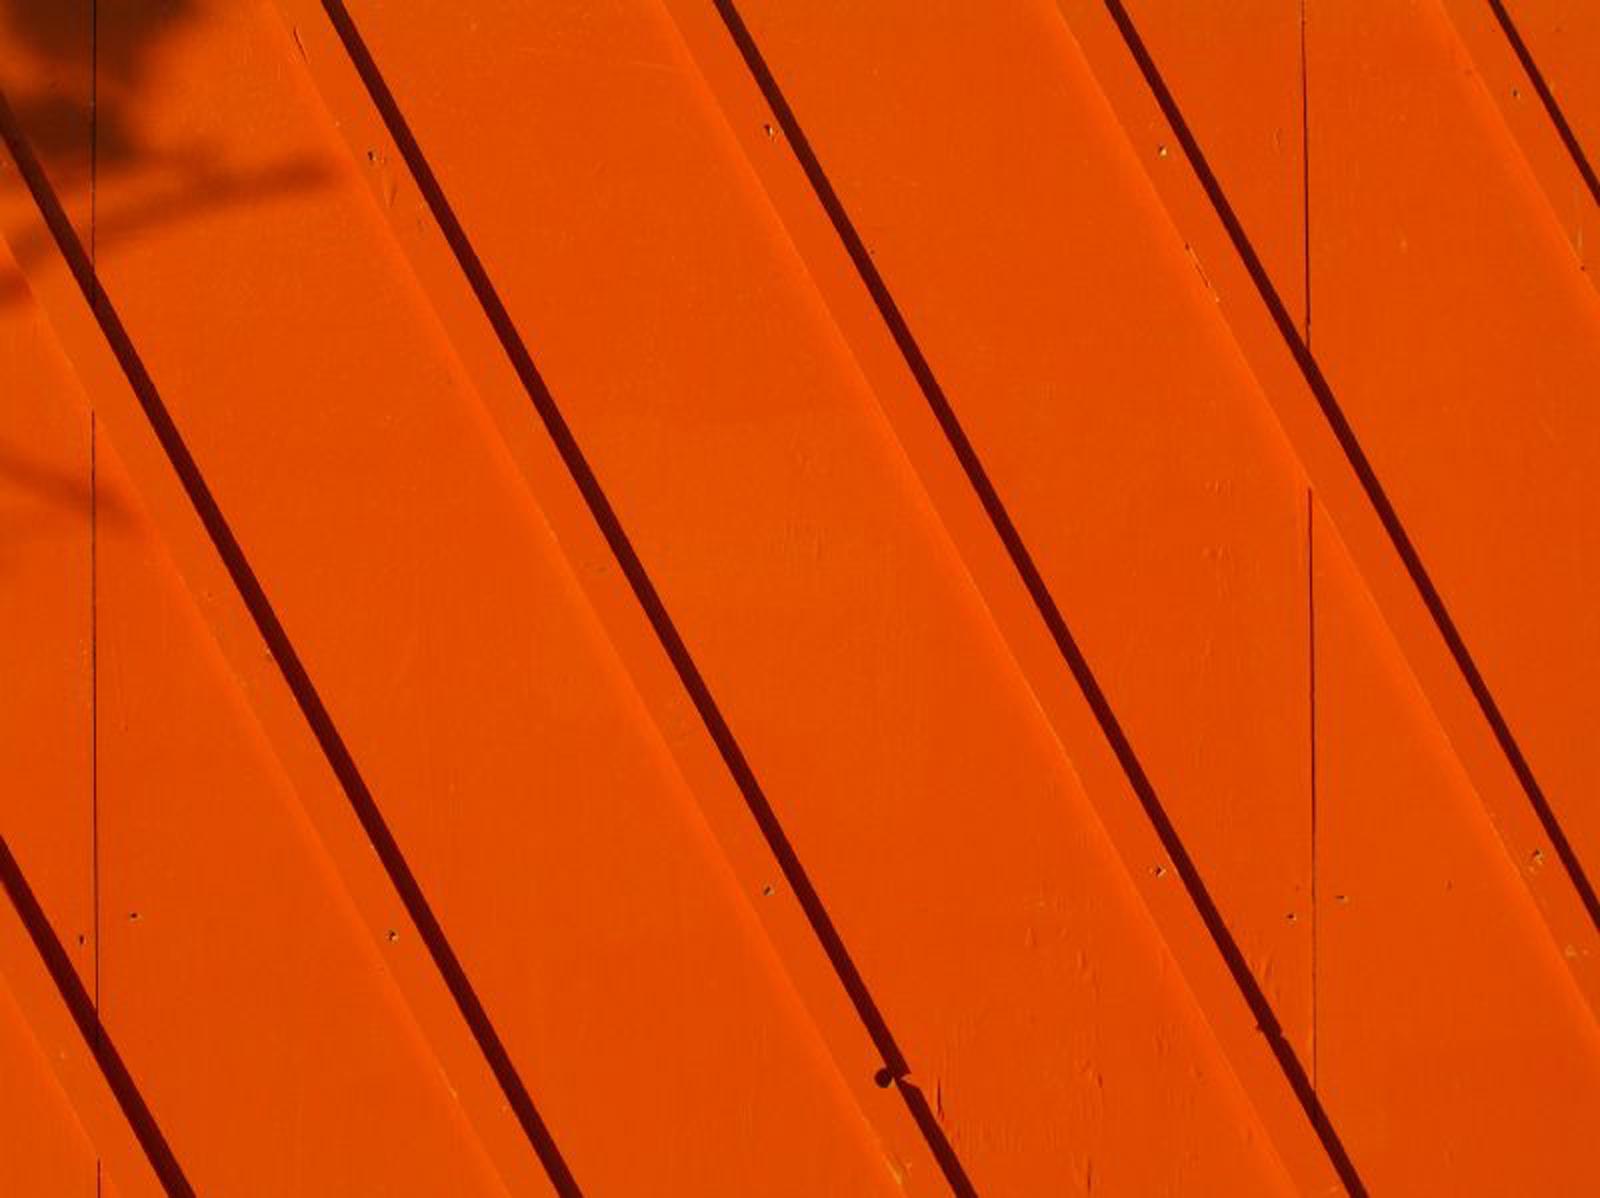 orange_shadow_1.jpg